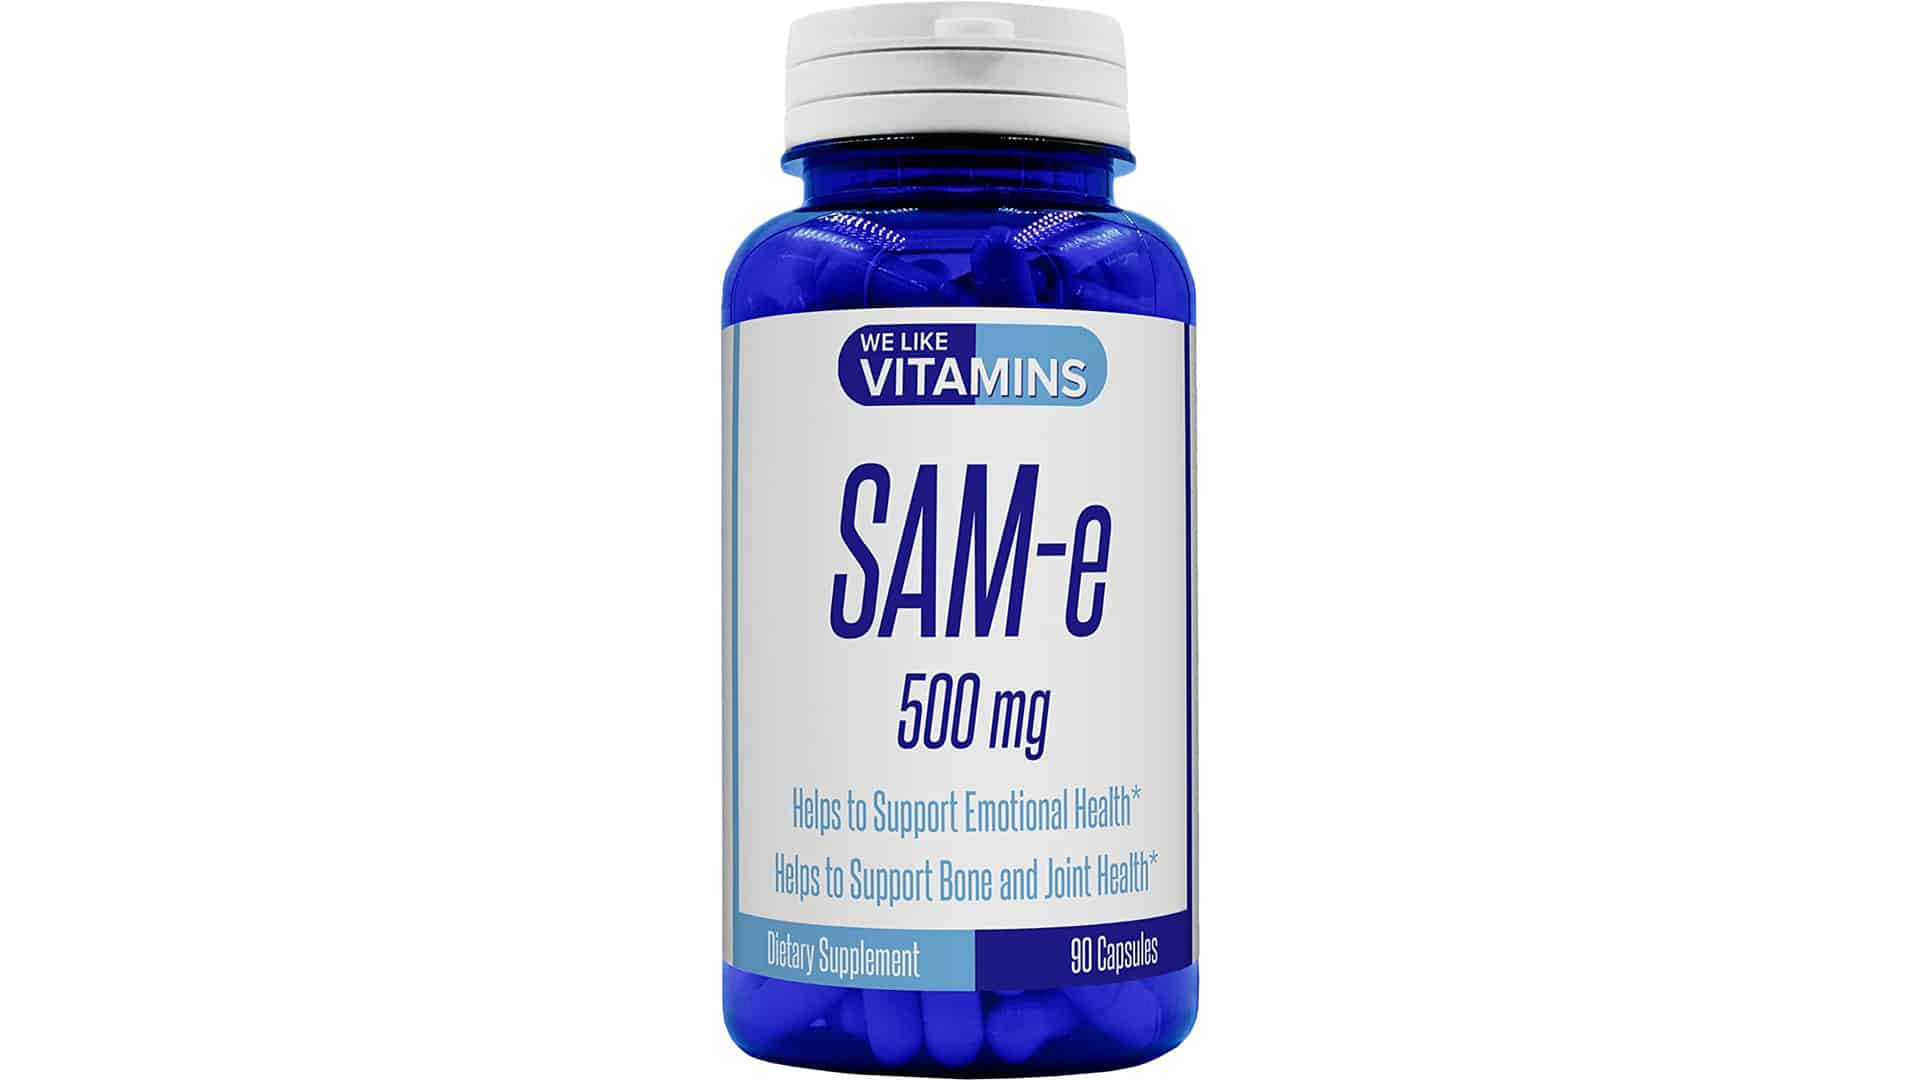 We Like Vitamins Best Value SAM-e